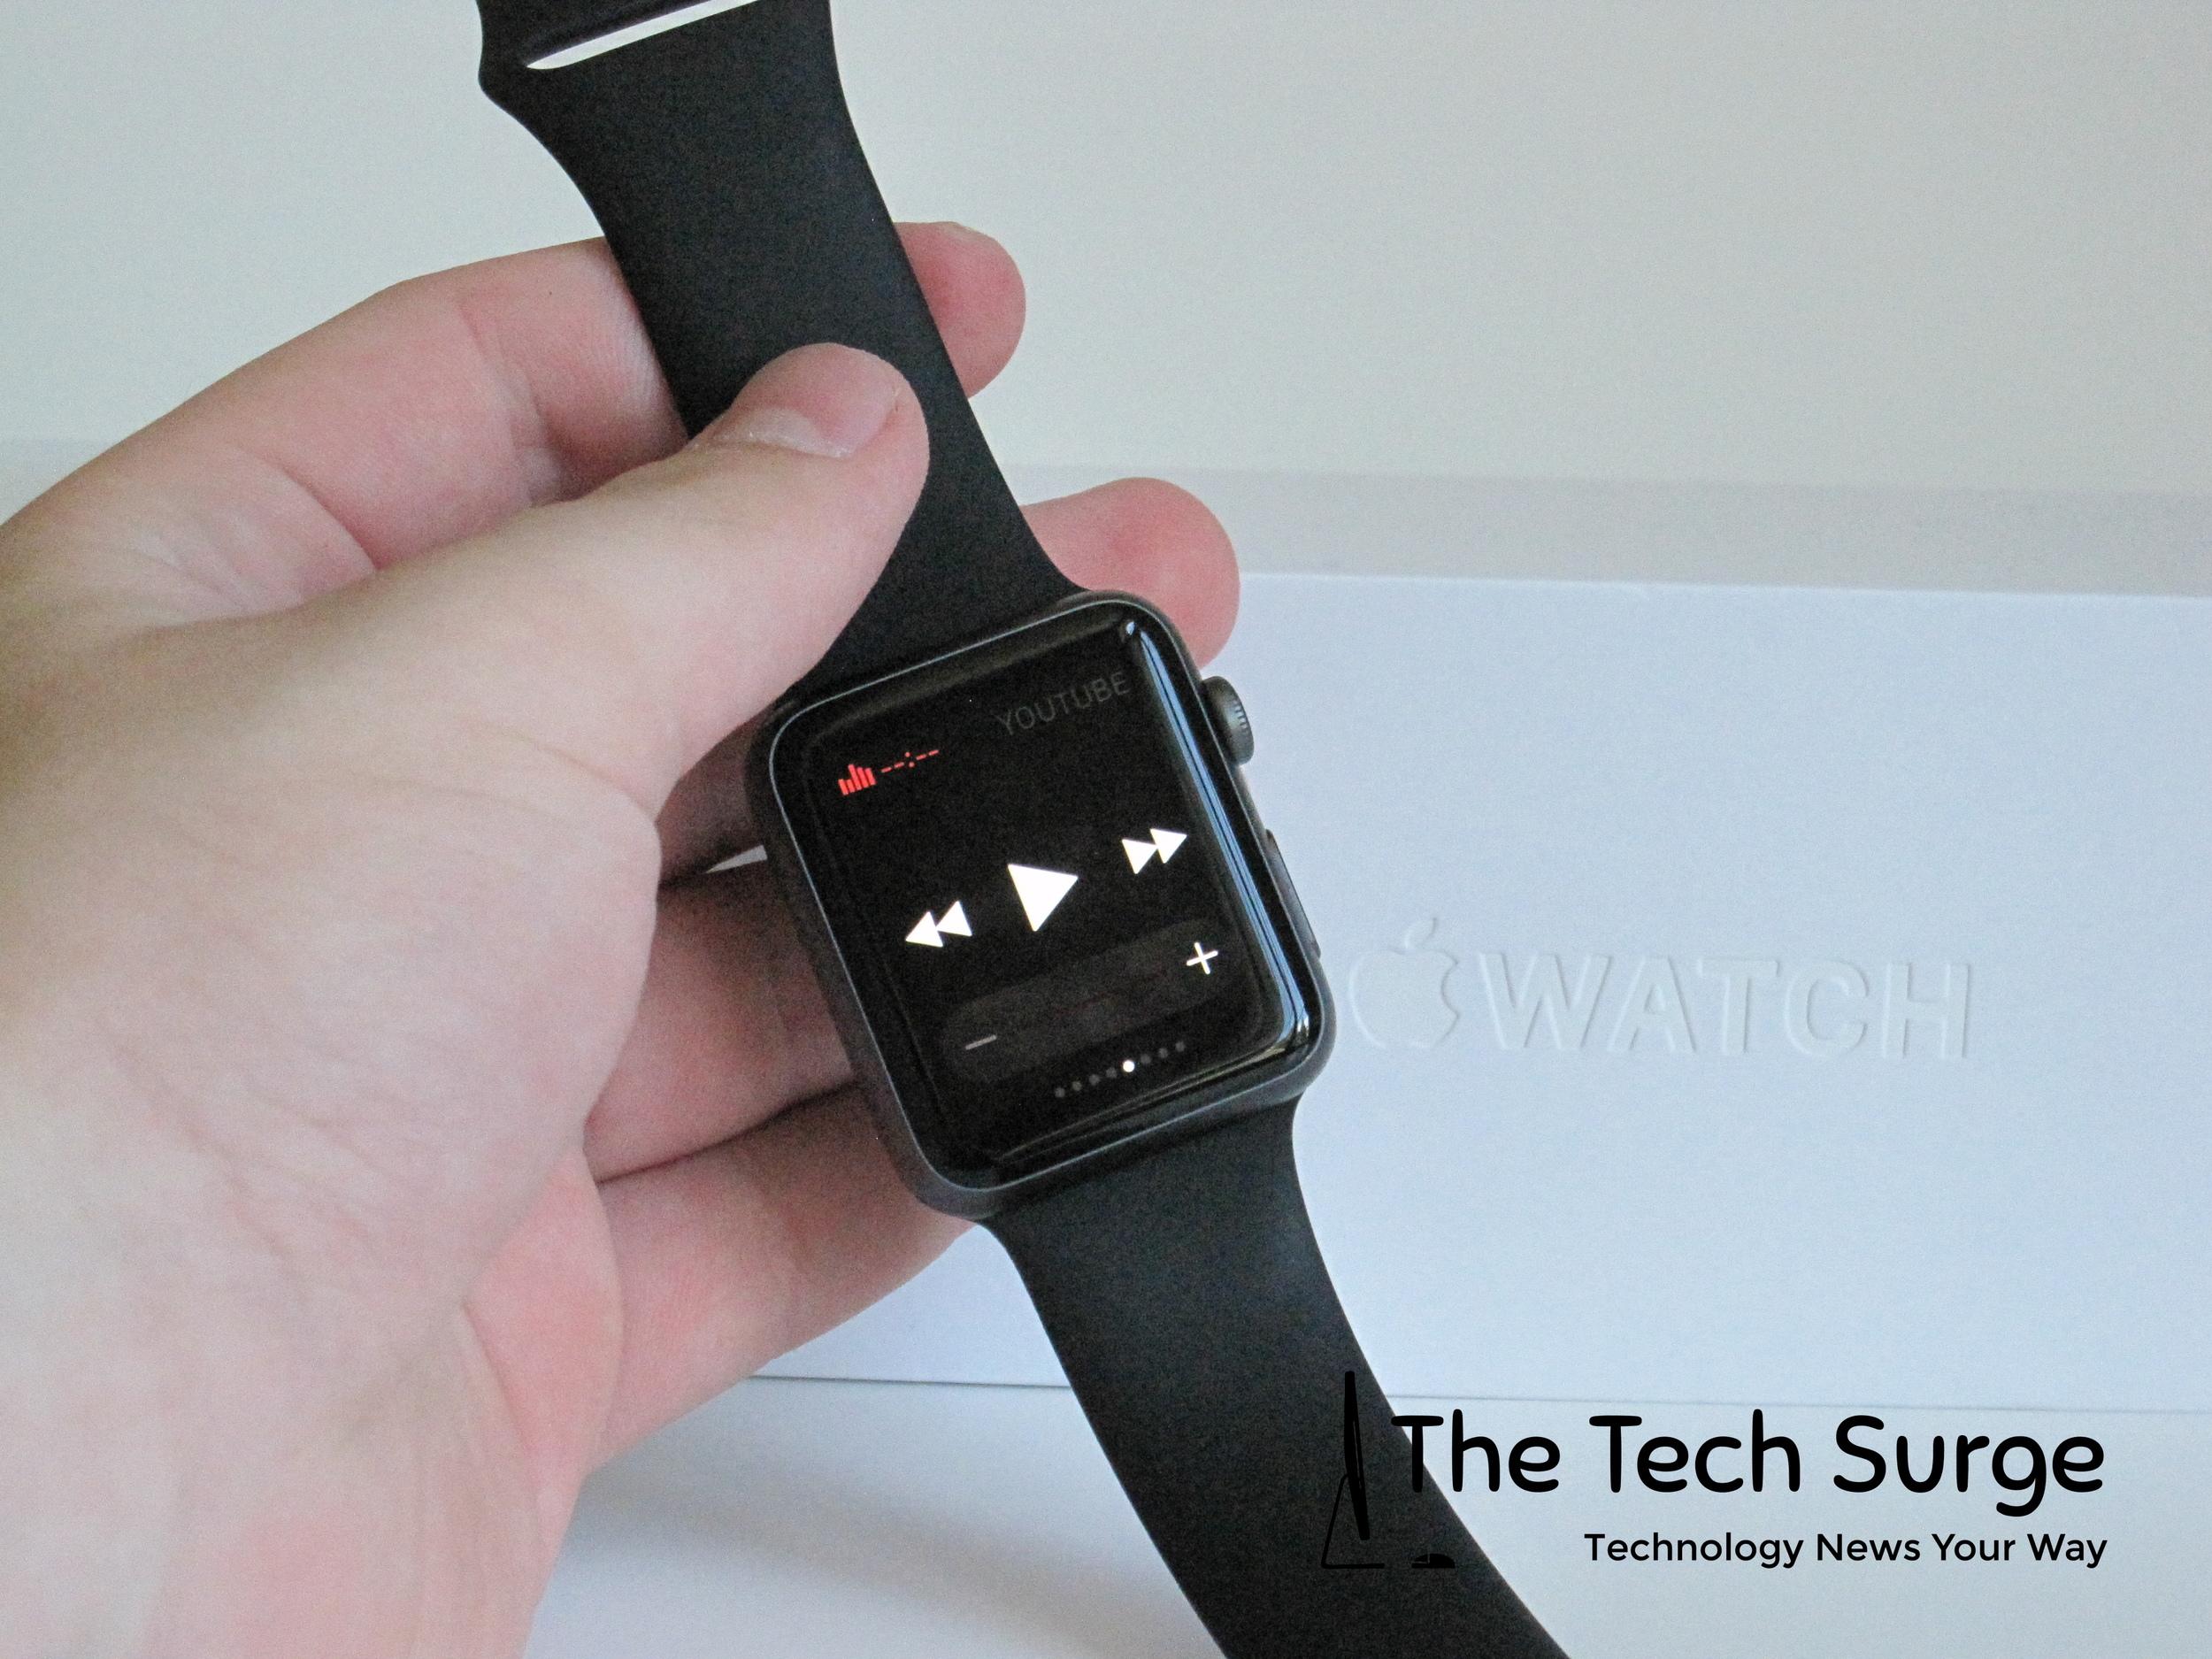 Apple's media control in glances